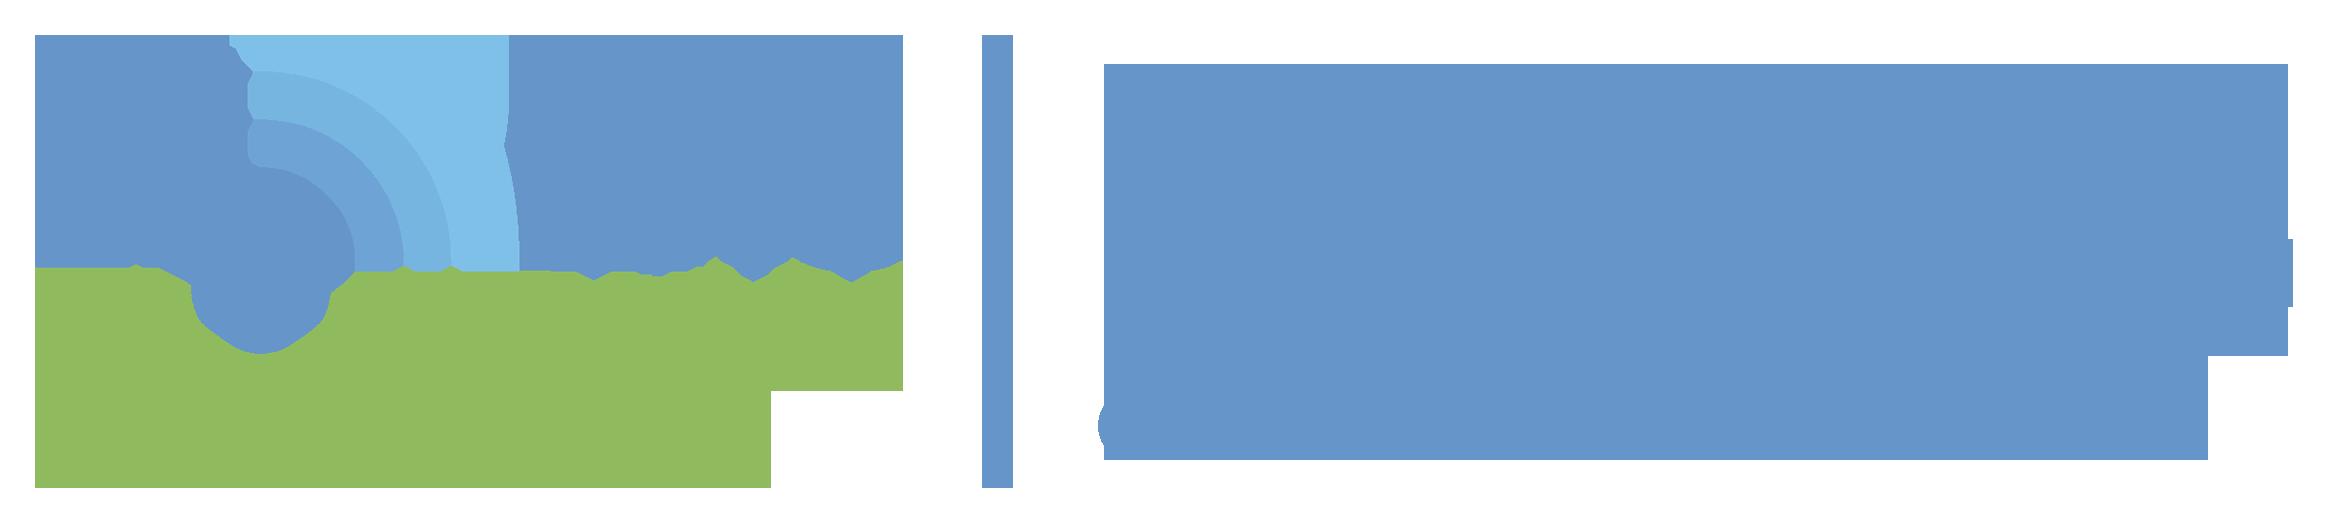 ЕИС ЖКХ